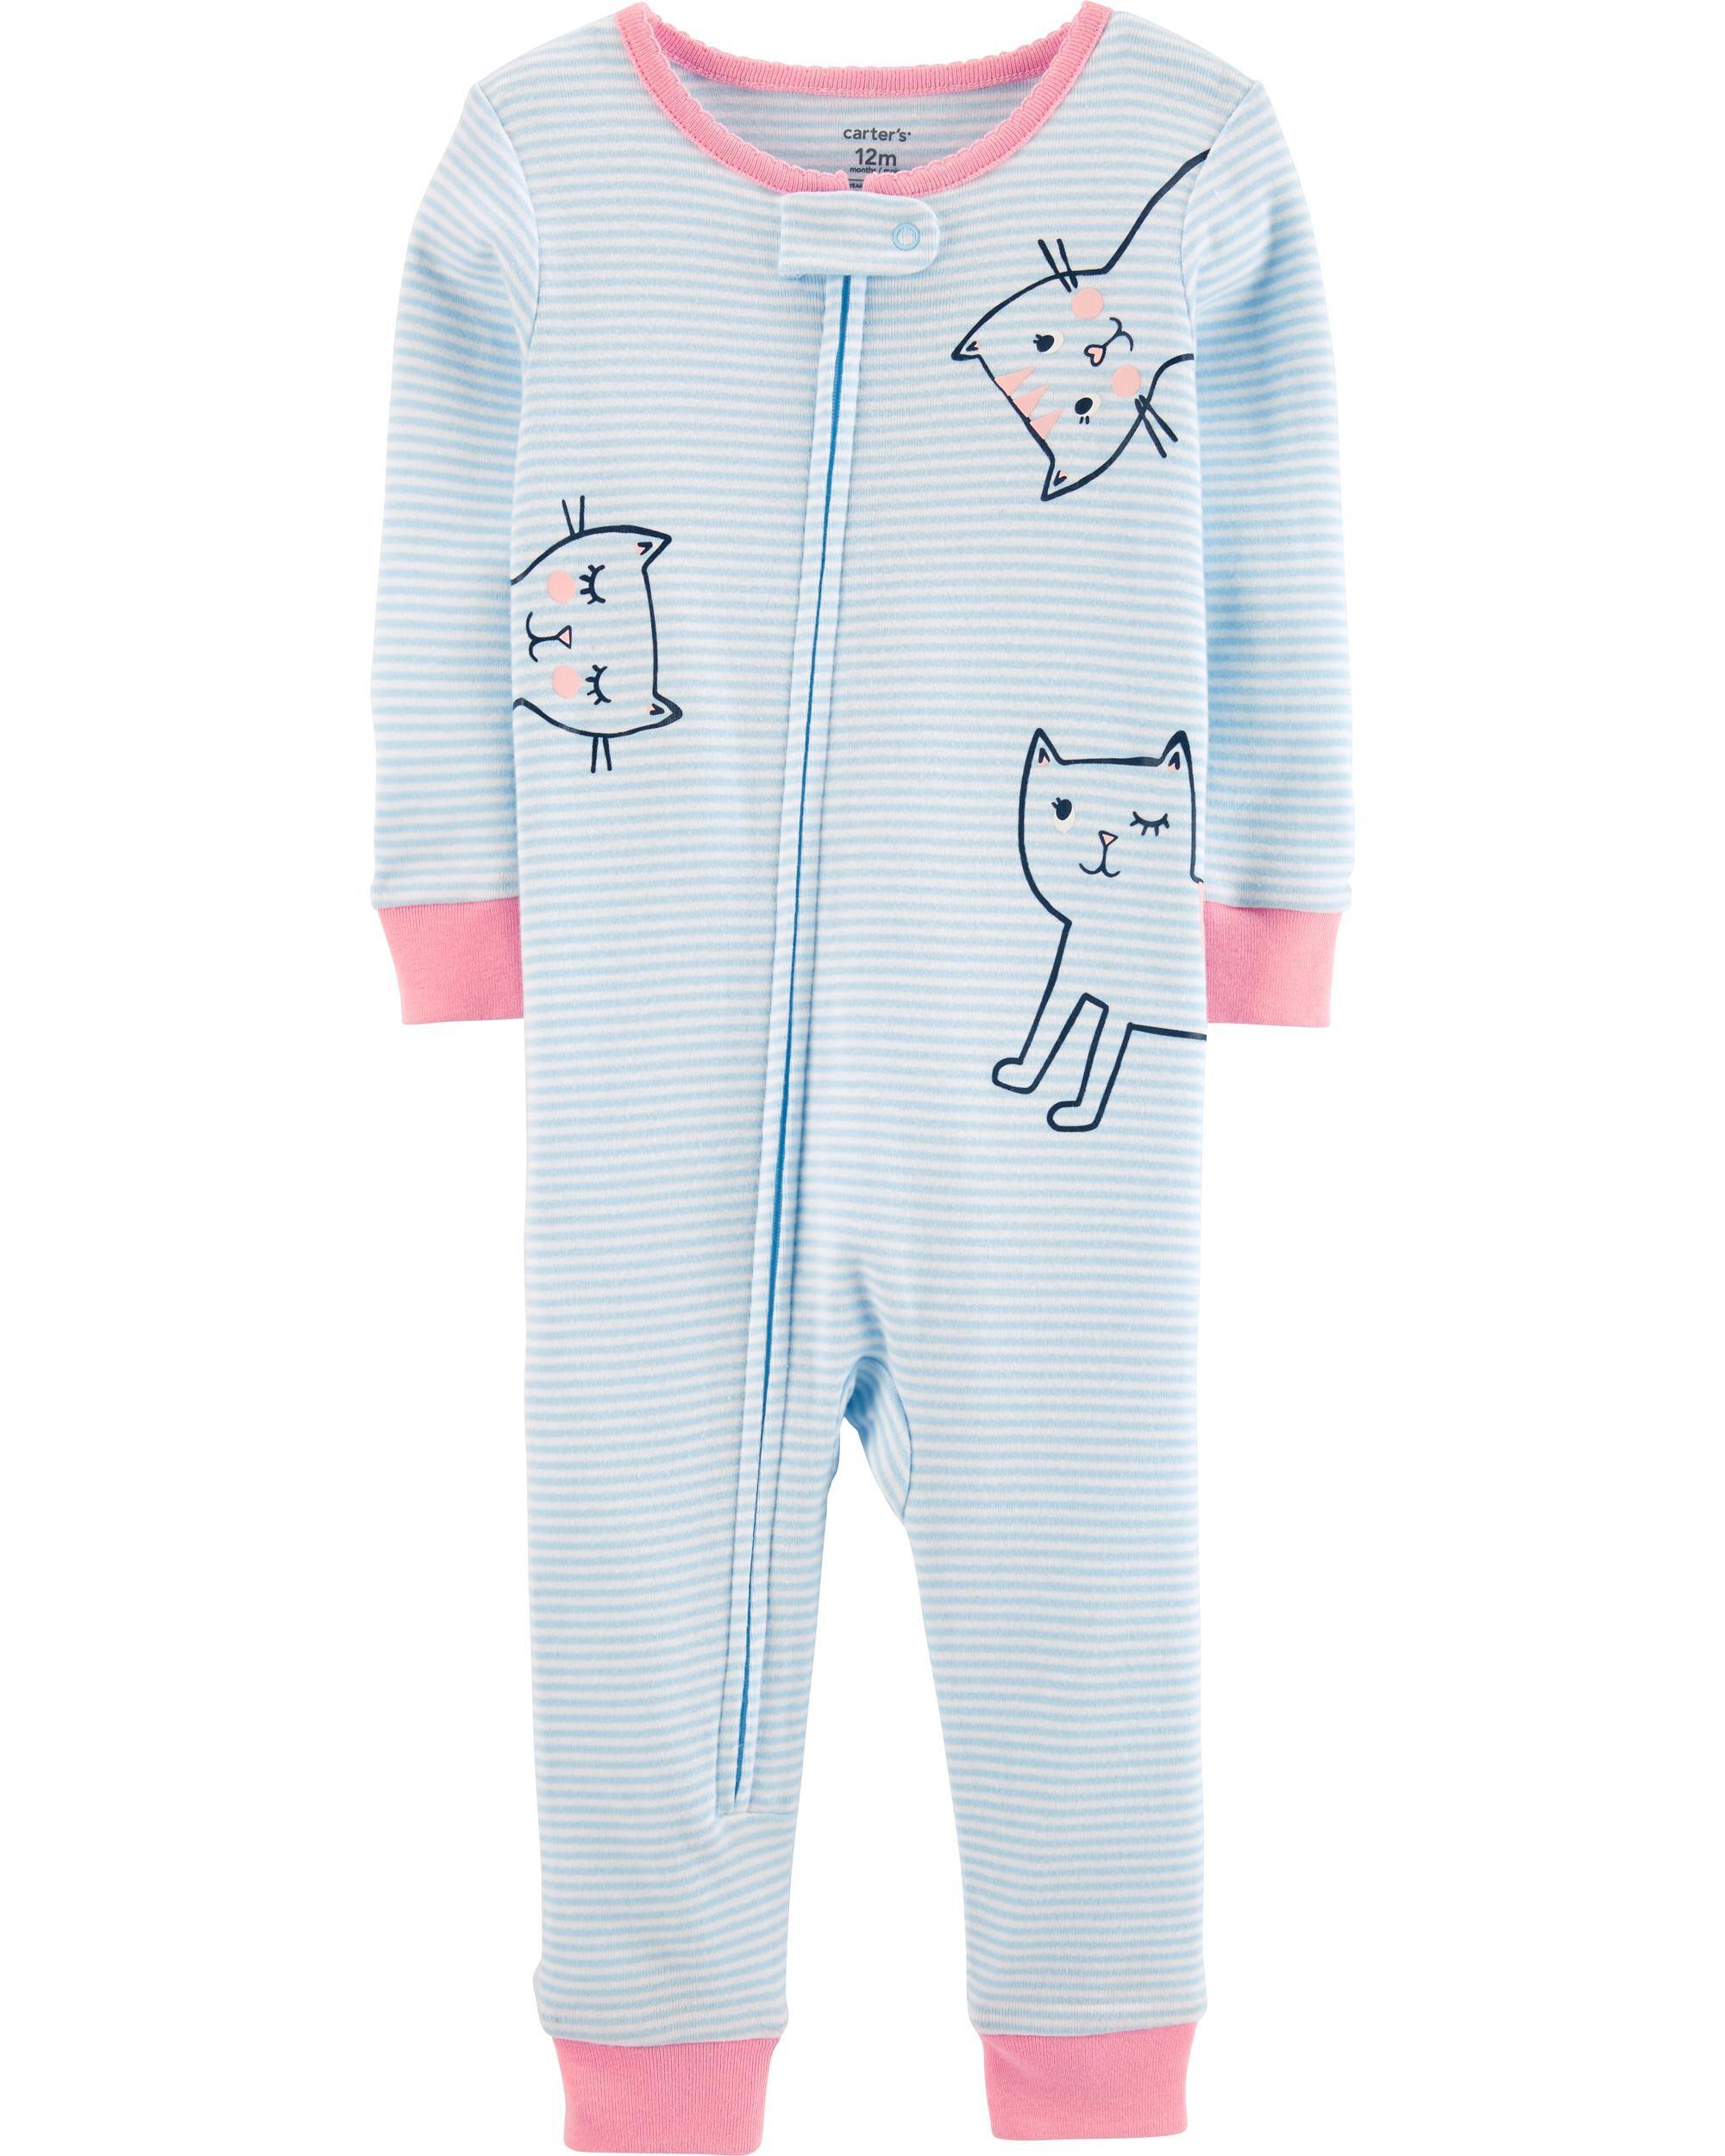 1-Piece Cats Snug Fit Cotton Footless PJs